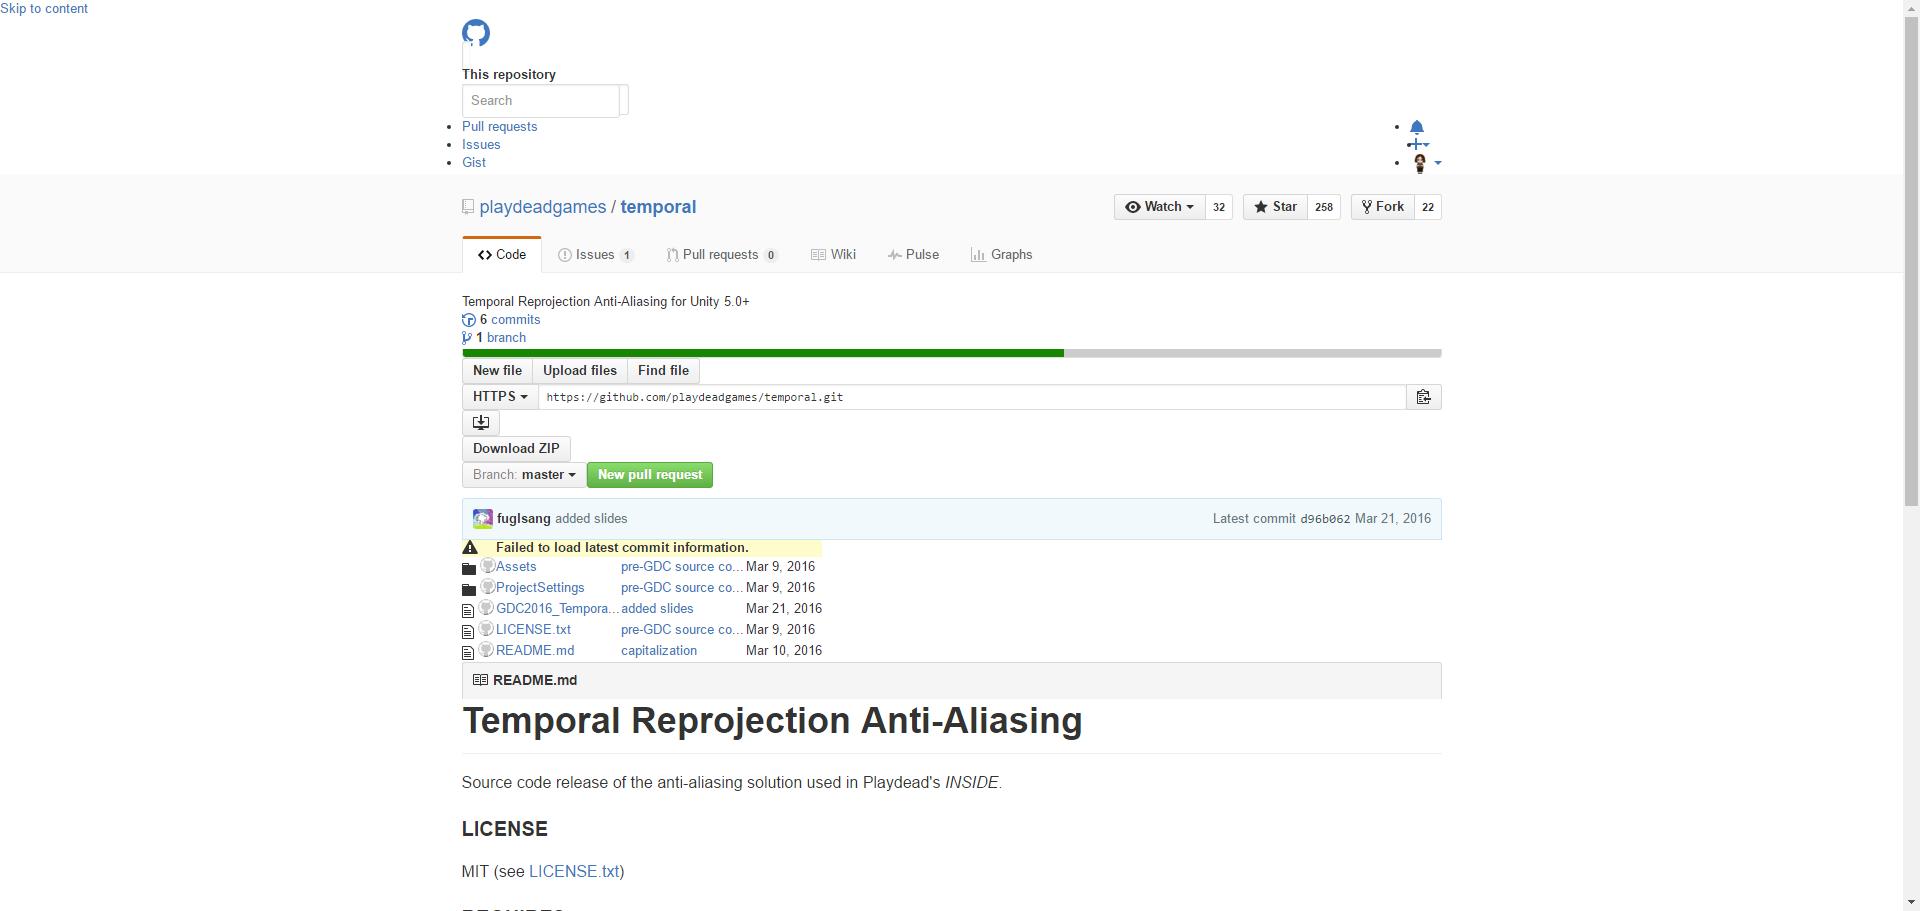 playdeadgames/temporal: Temporal Reprojection Anti